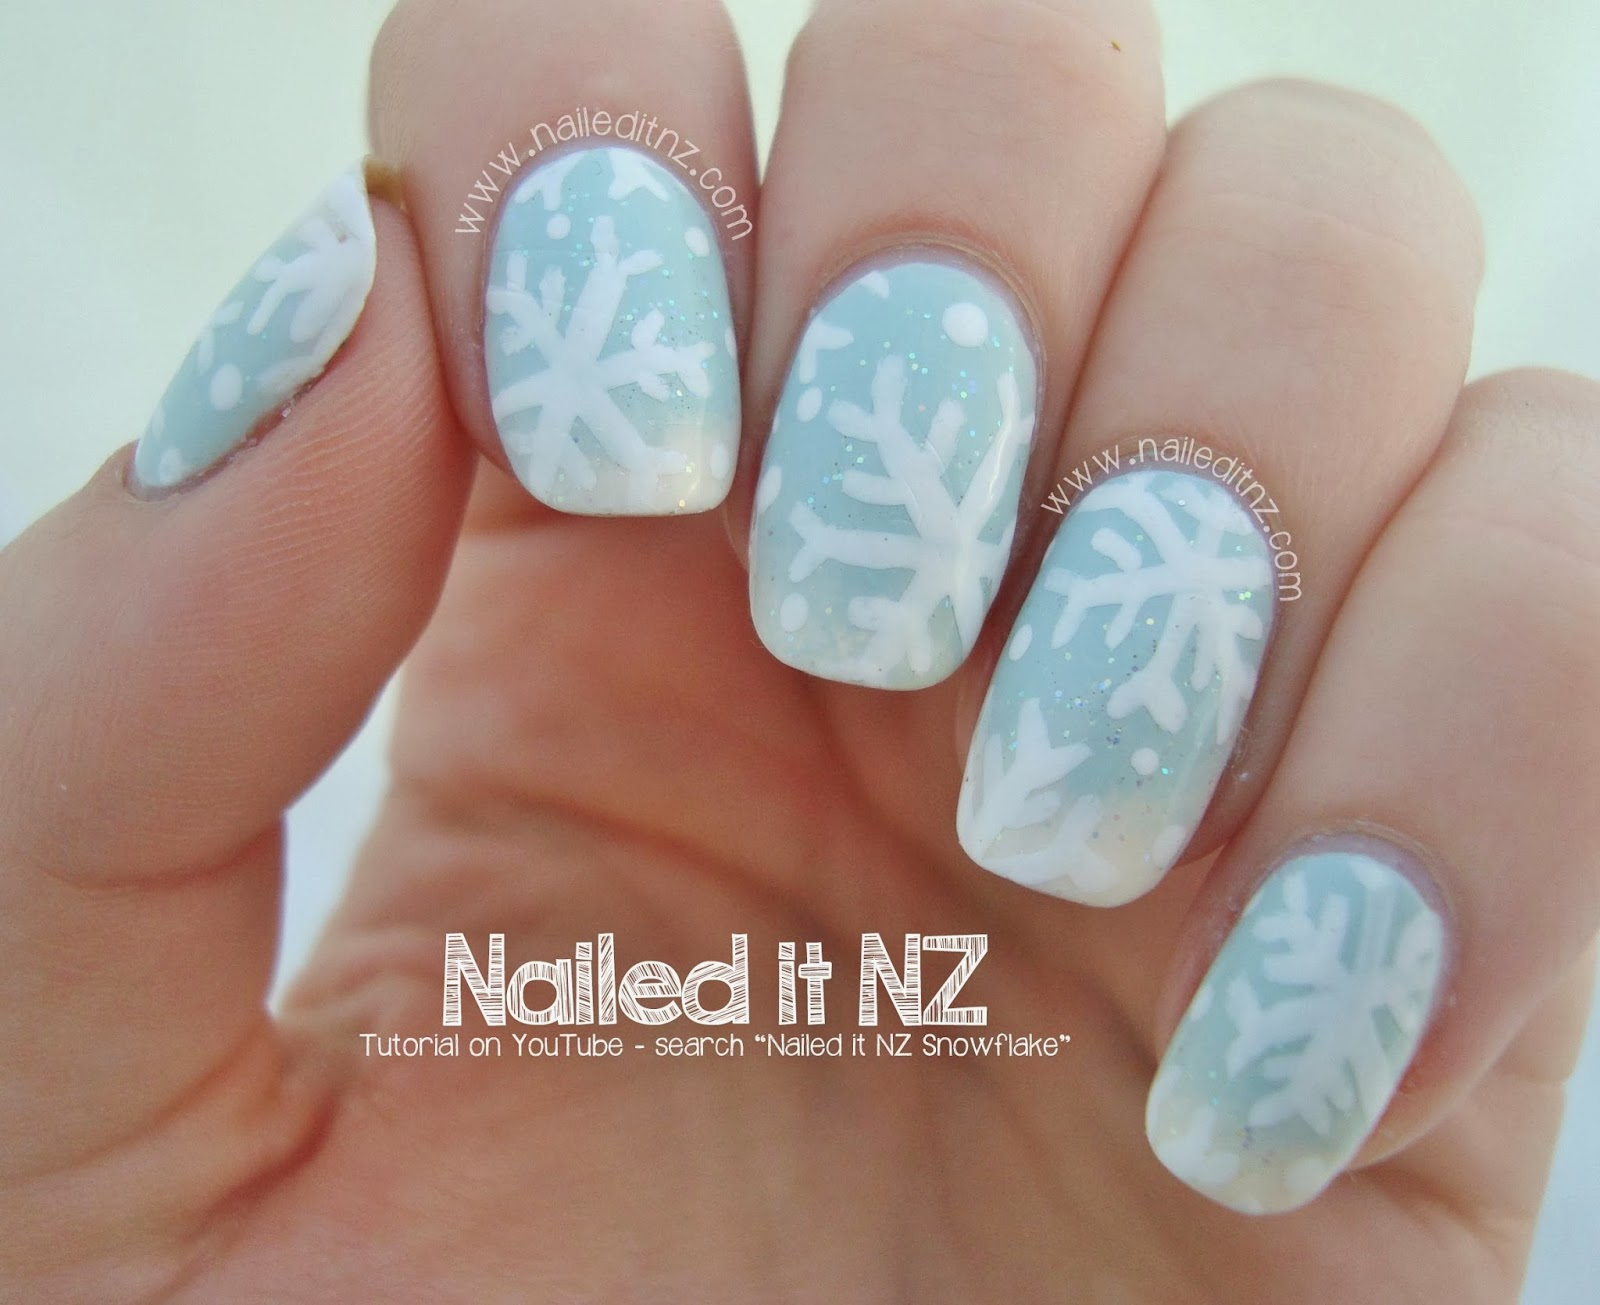 Snowflake Nail Art Tutorial | 12 Days of Christmas Nail Art Challenge